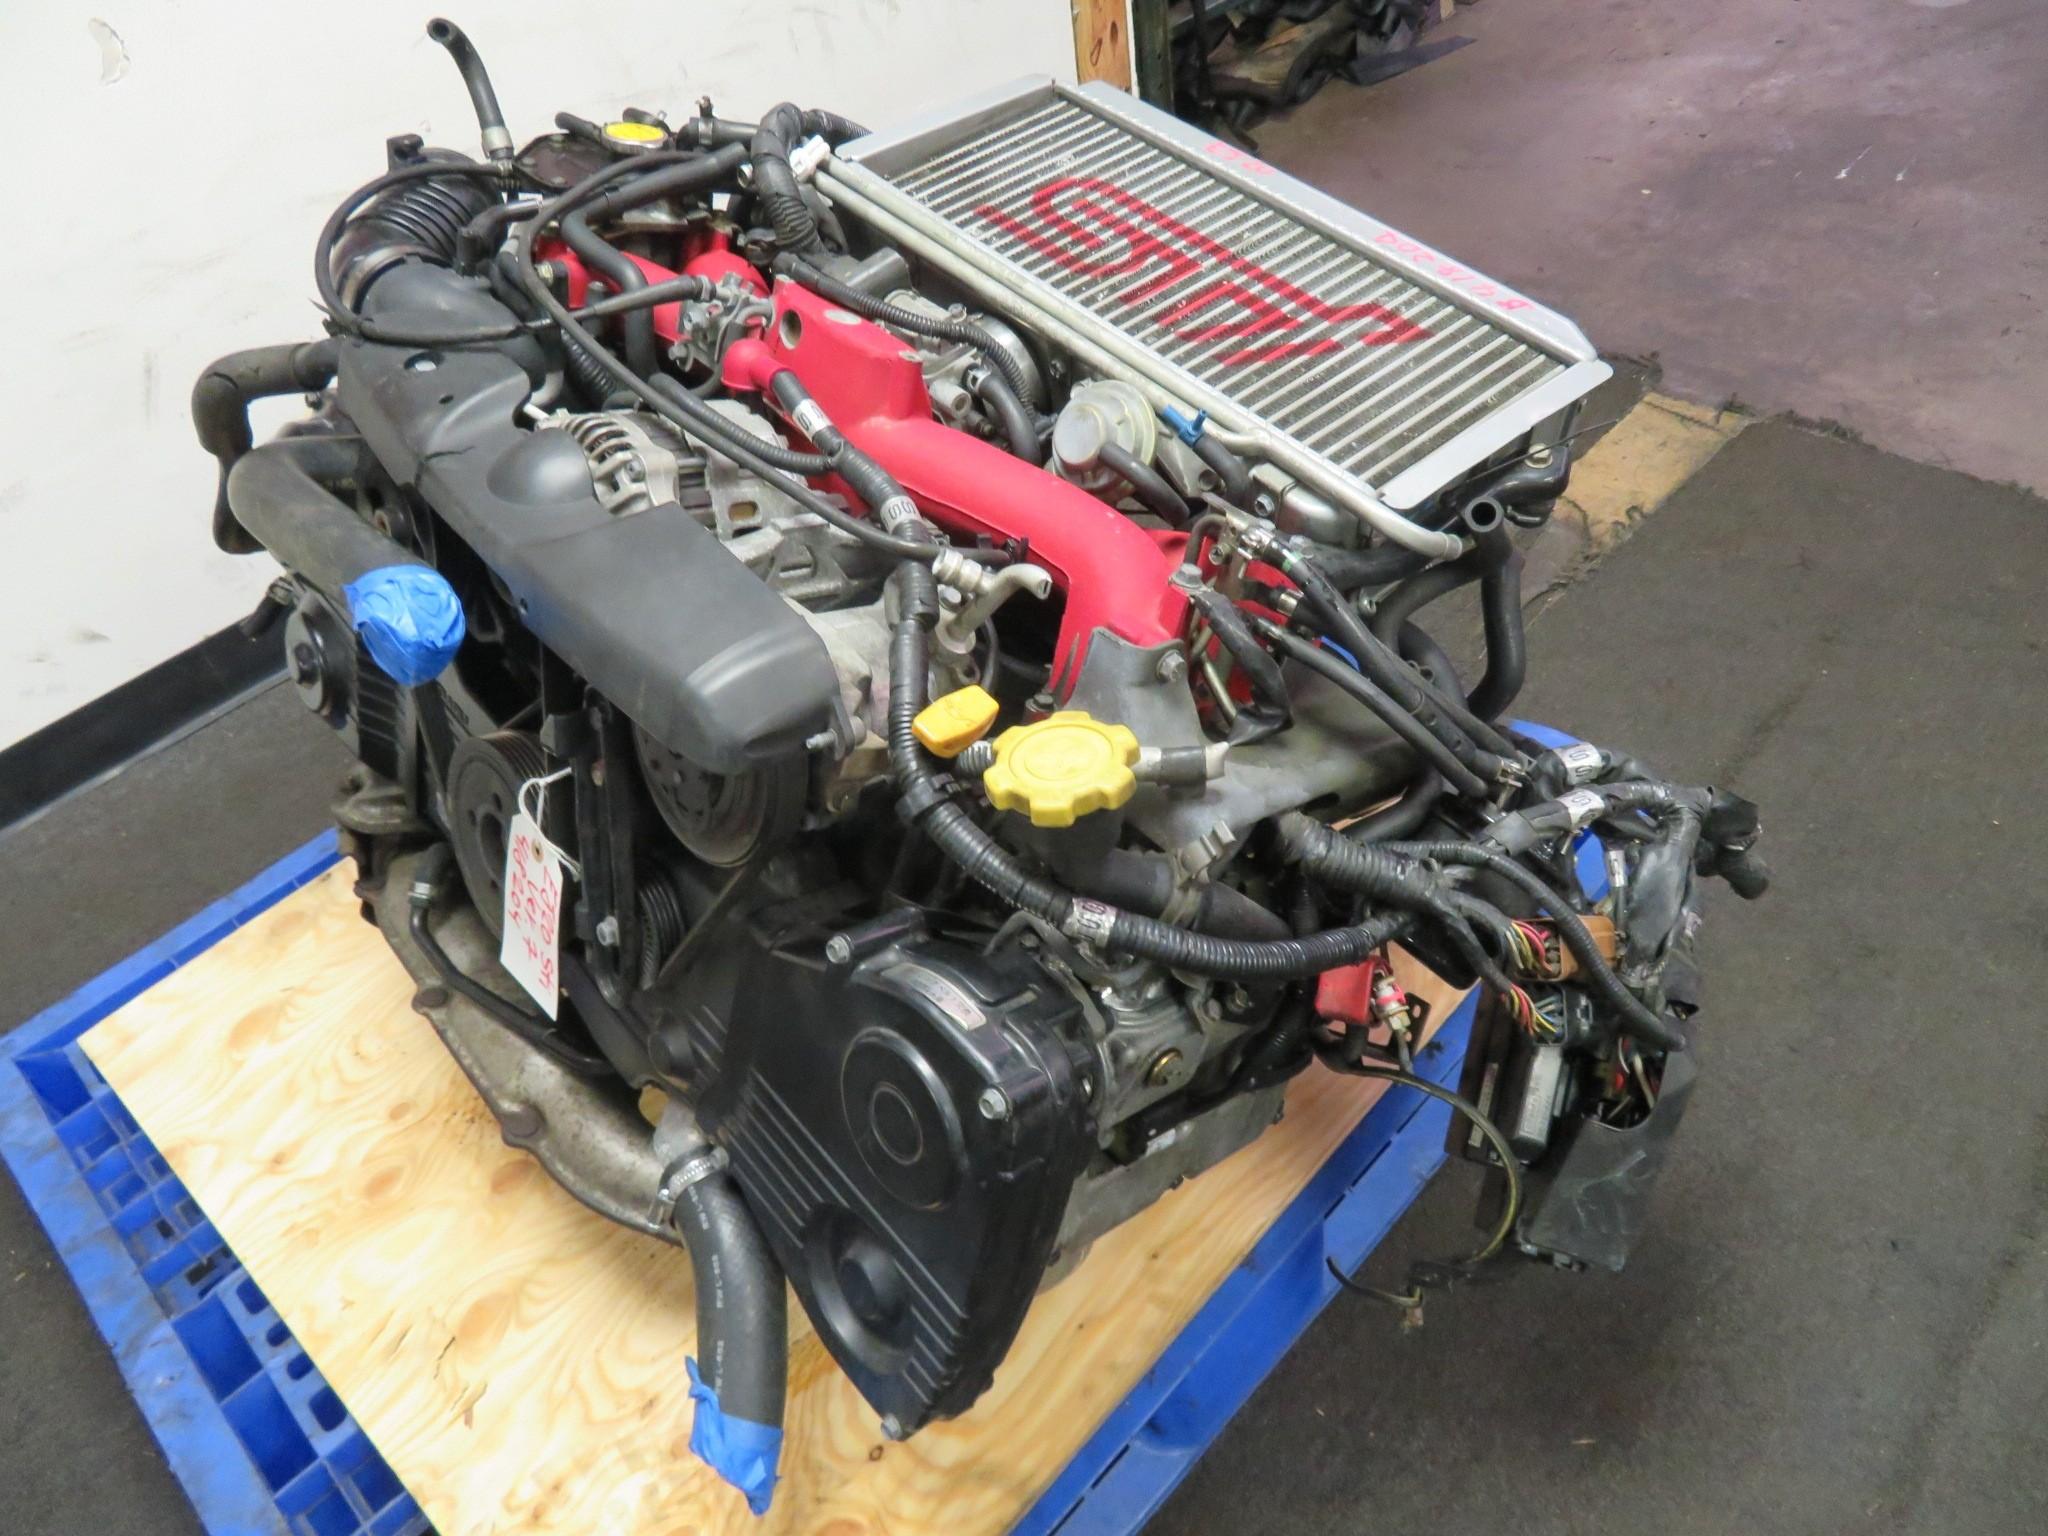 01-03 JDM SUBARU WRX STI VERSION 7 EJ20 2.0L TURBO ENGINE, INTERCOOLER, ECU